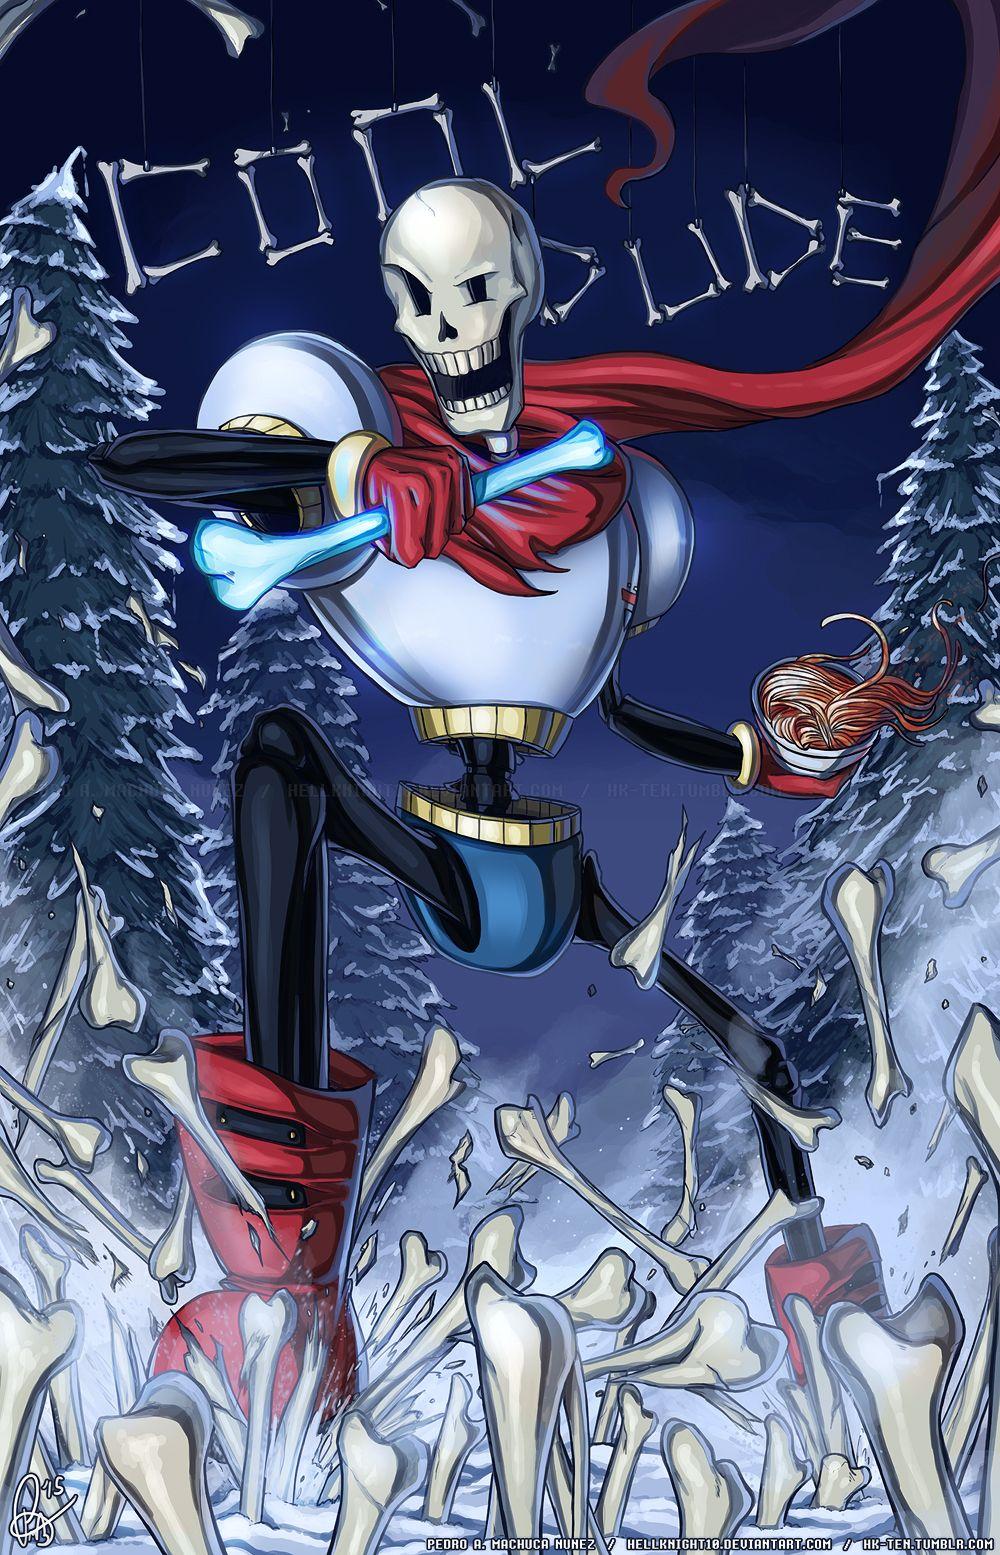 UNDERTALE - Cool Dude Papyrus by Hellknight10.deviantart.com on @DeviantArt